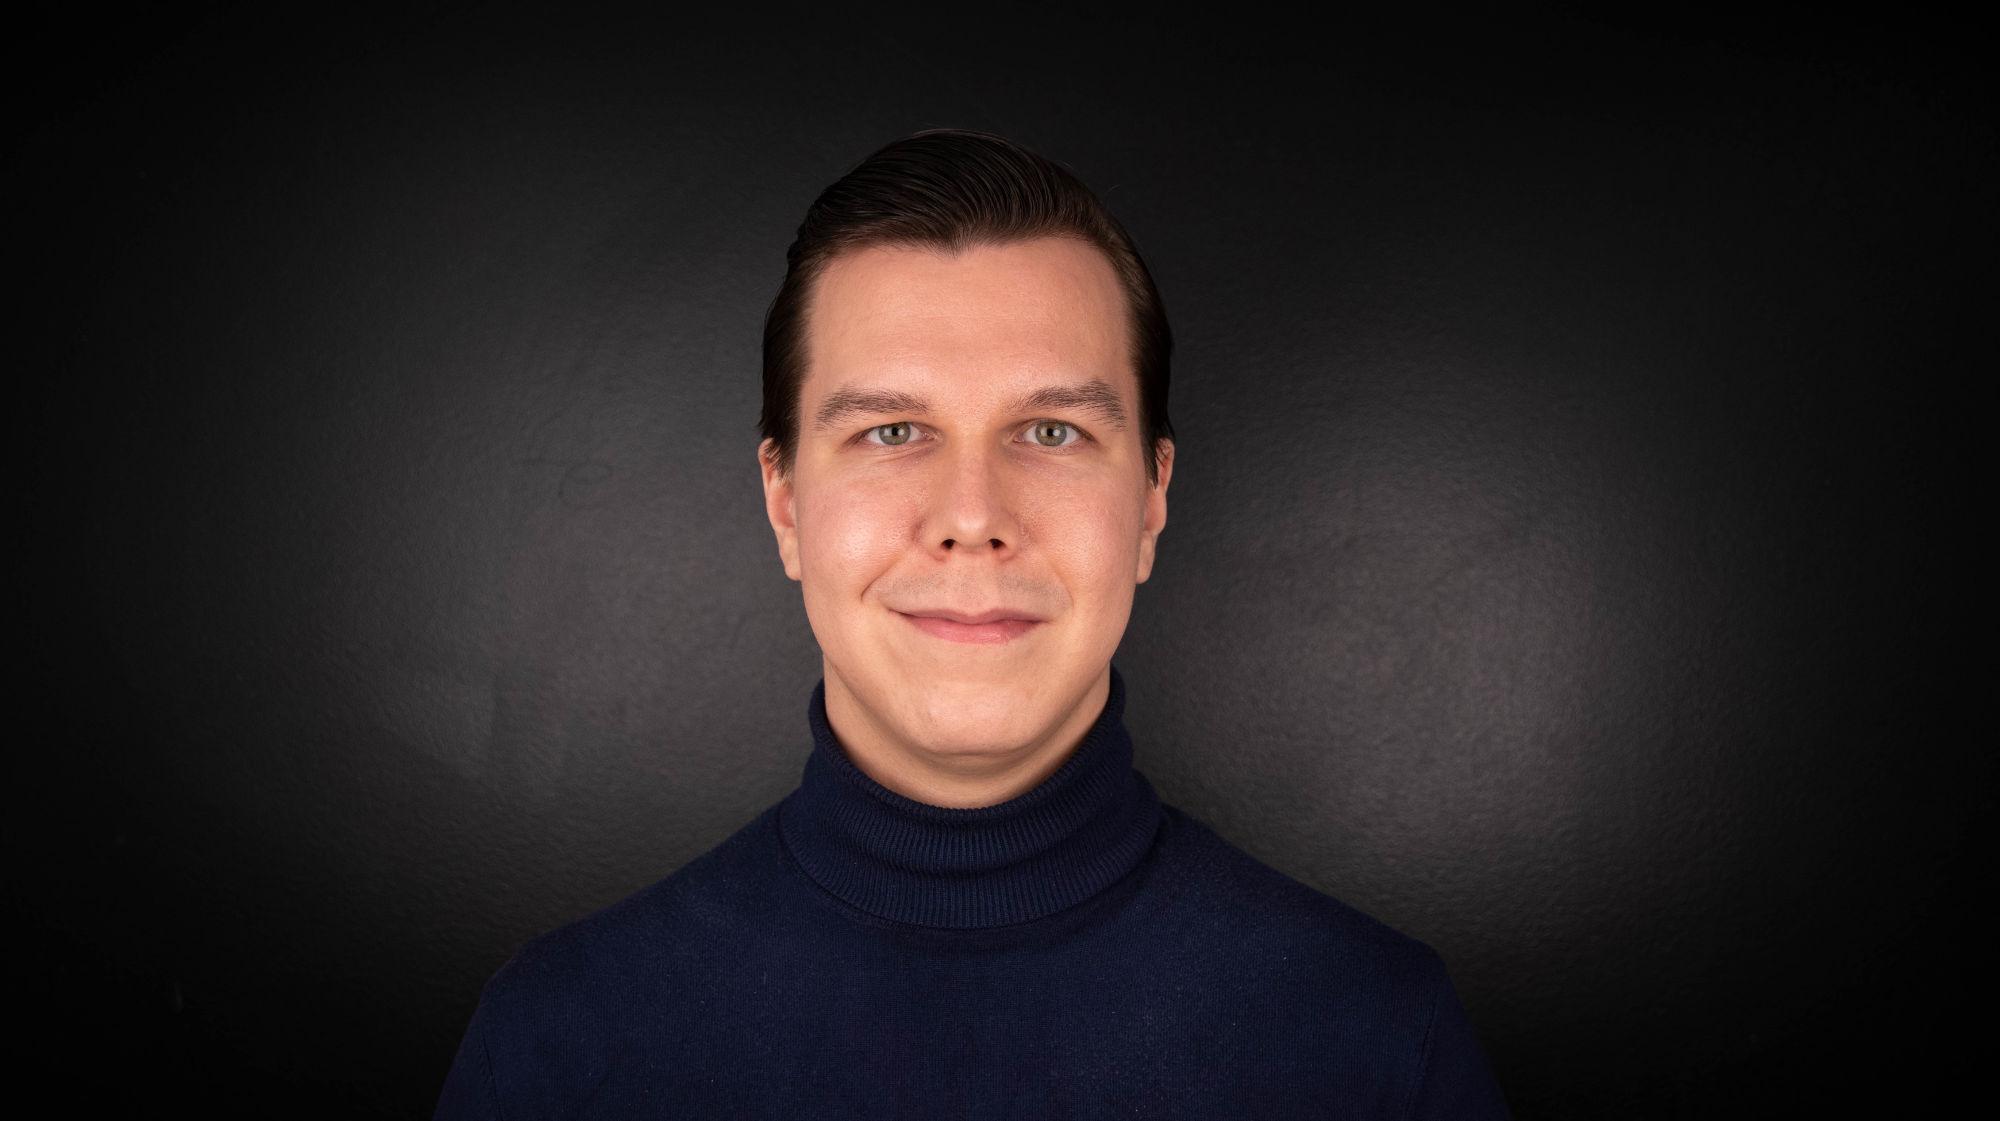 A picture of Kosti Hokkanen